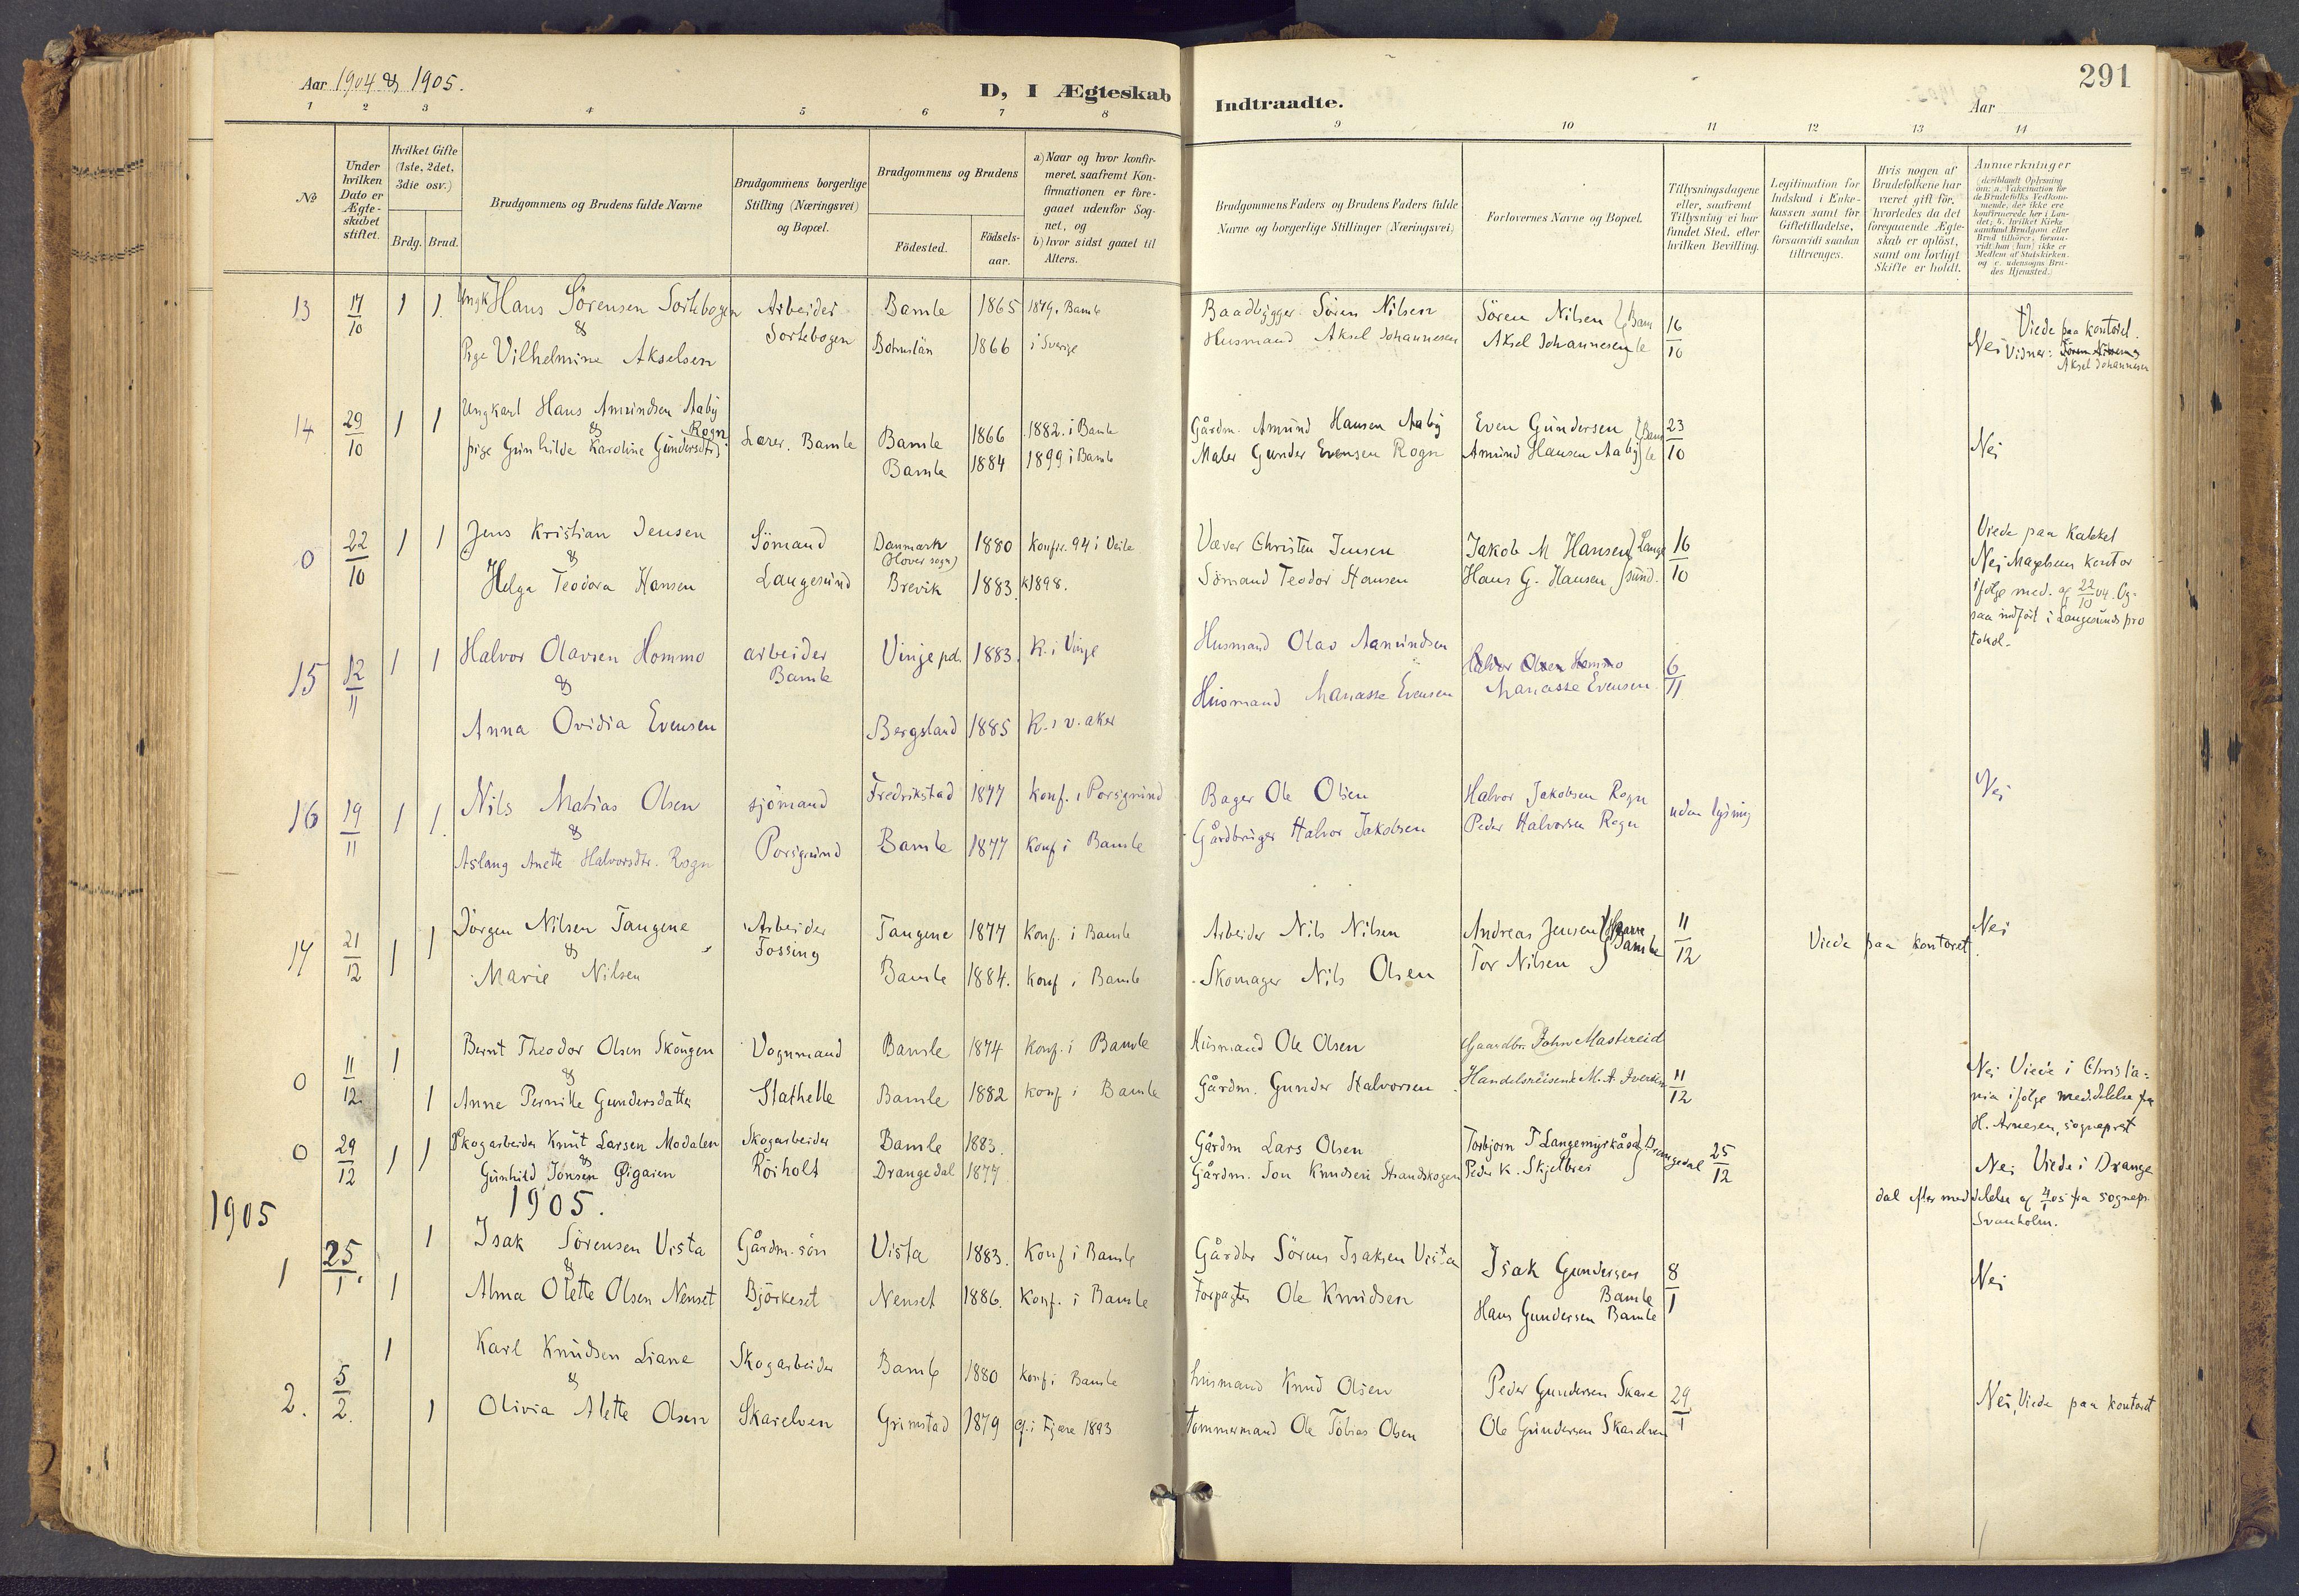 SAKO, Bamble kirkebøker, F/Fa/L0009: Ministerialbok nr. I 9, 1901-1917, s. 291